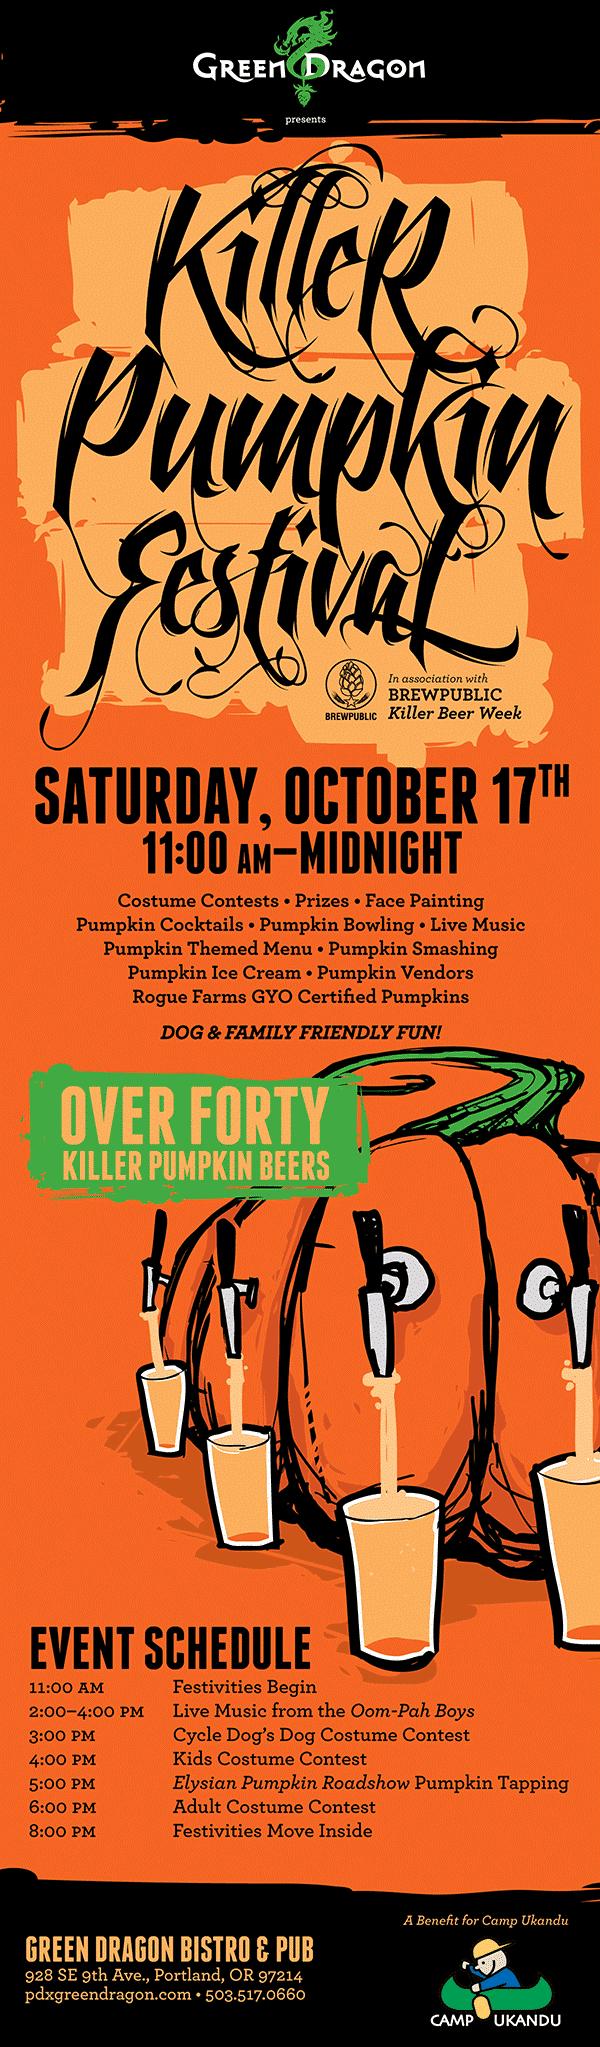 Killer Beer Week - Killer Pumpkin Fest Poster 2015